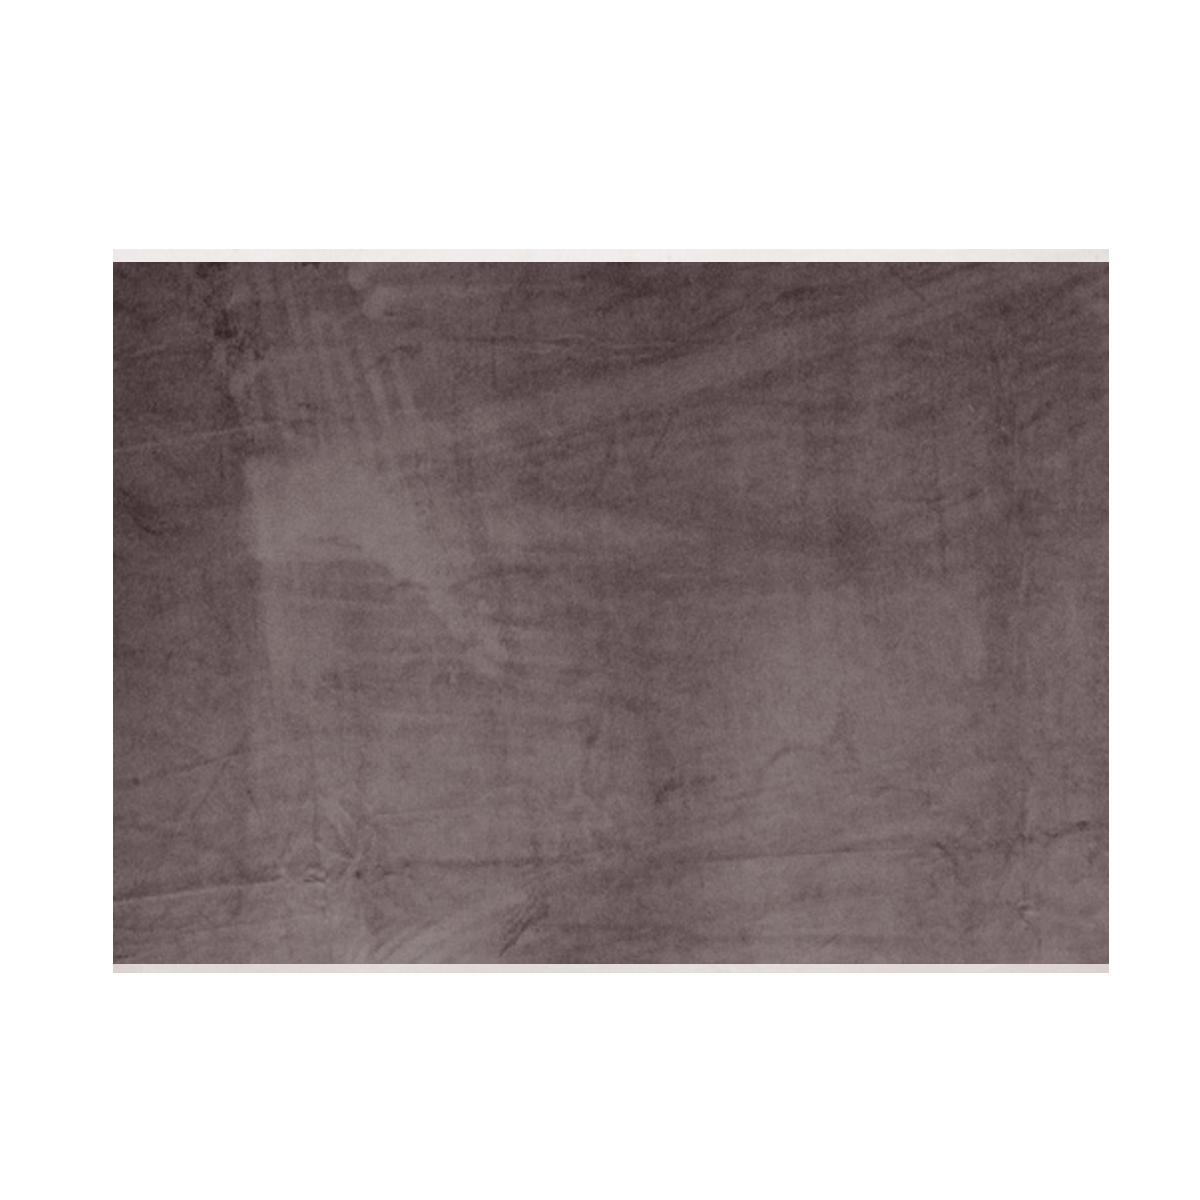 Tissu uni en 100% polyester - Marron Clair - 1.5 m